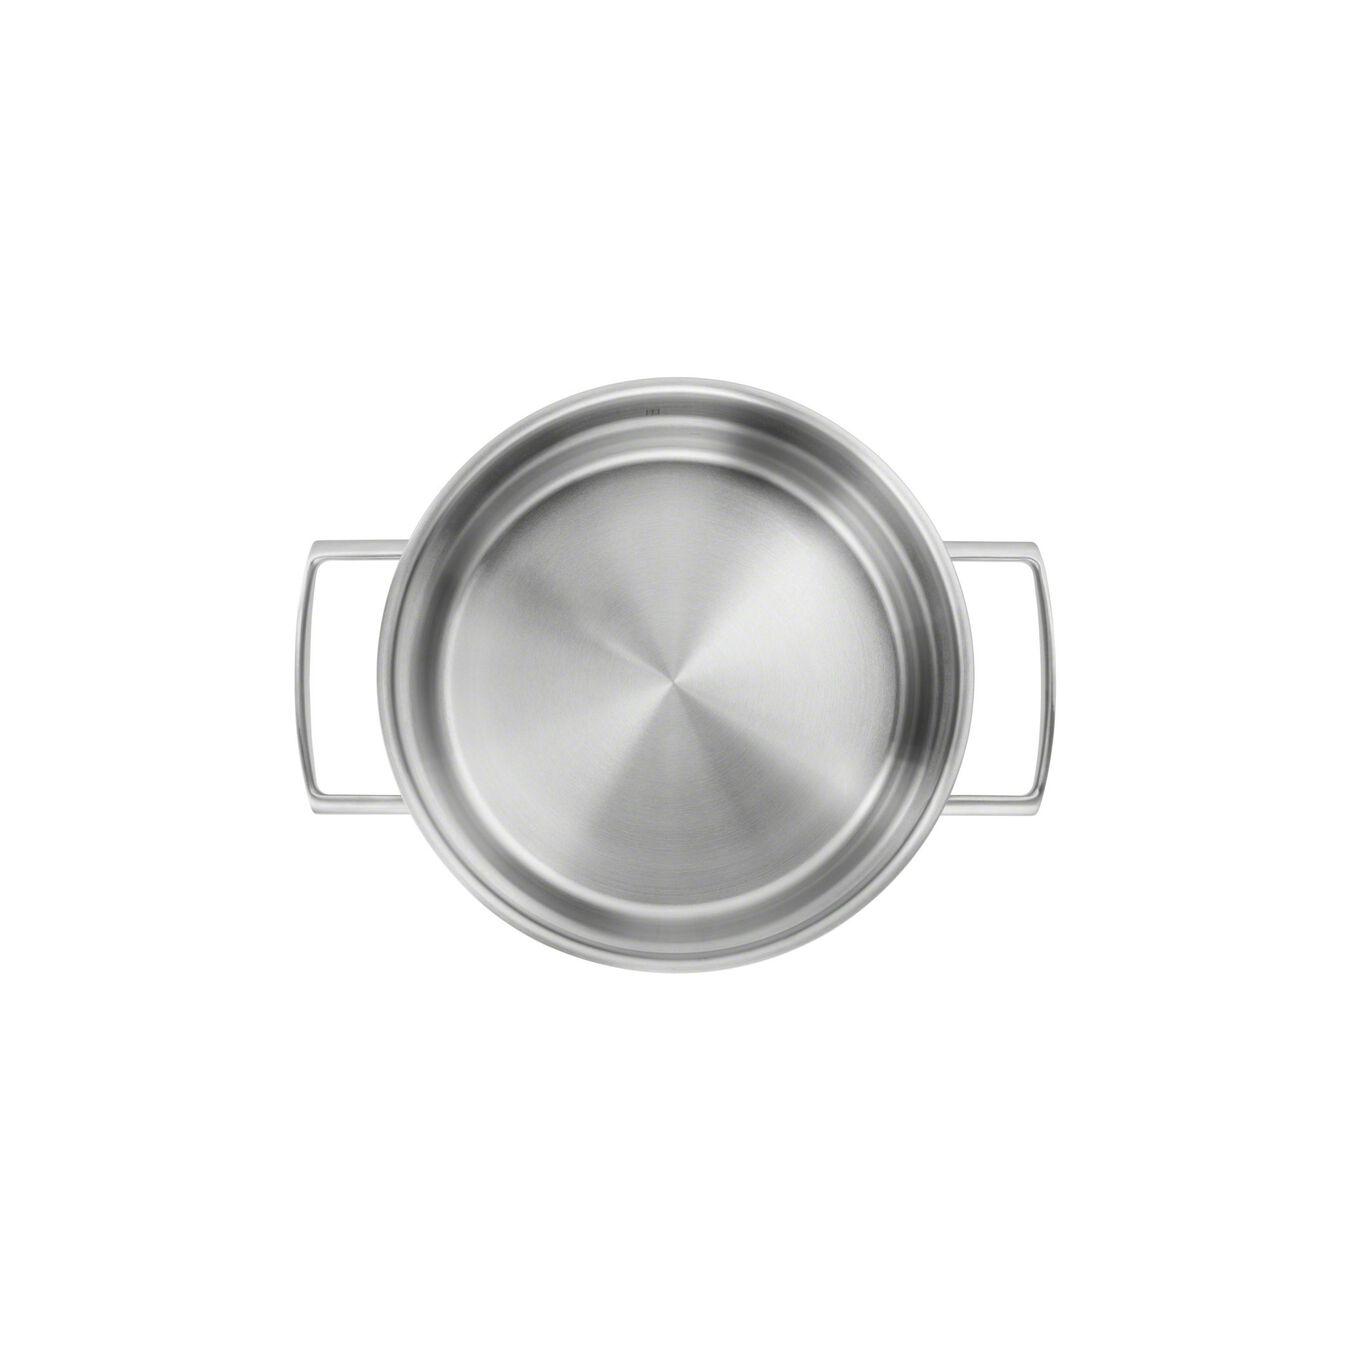 Tencere Seti | 18/10 Paslanmaz Çelik | 5-parça,,large 7